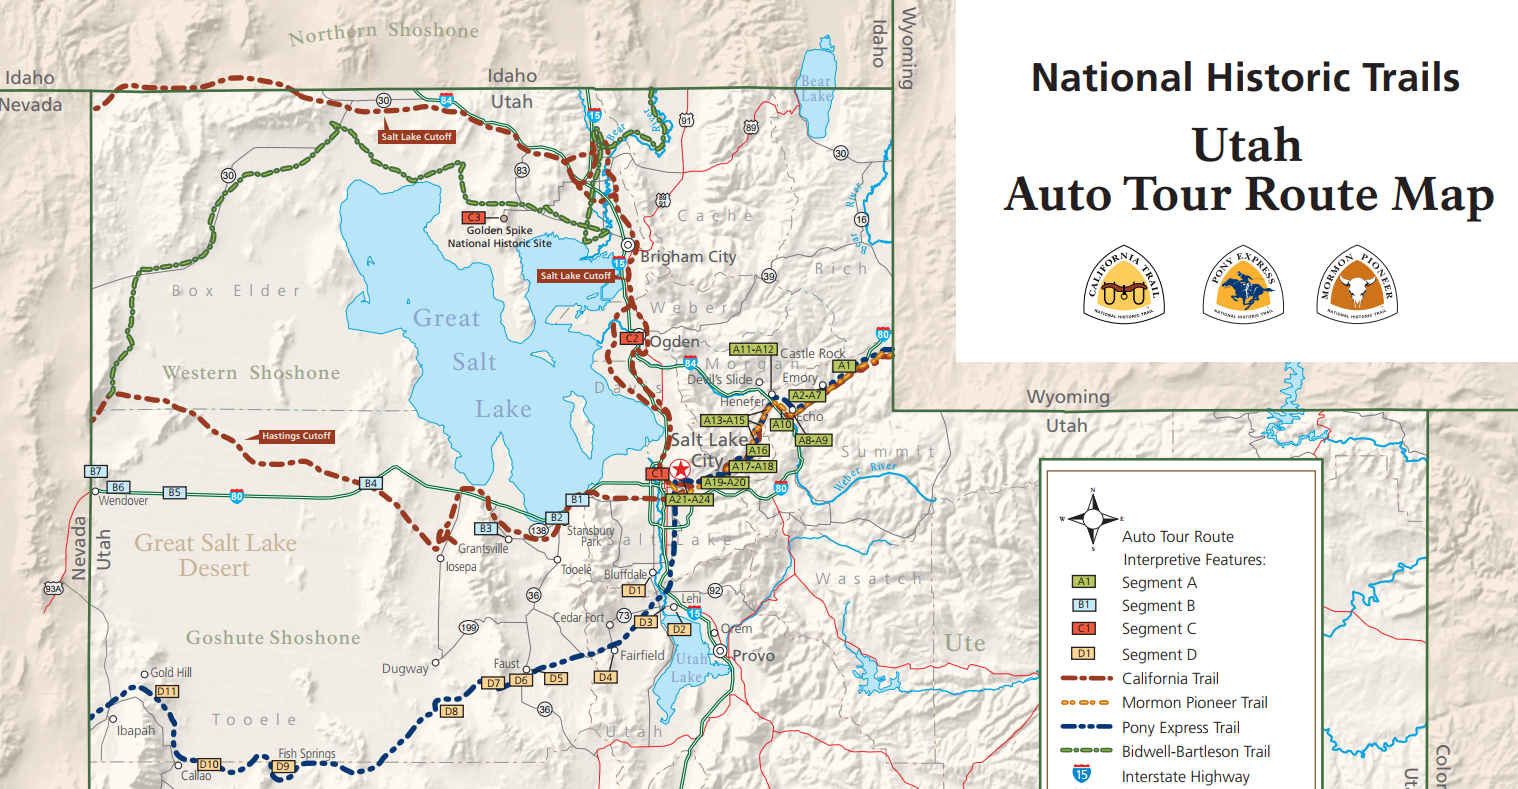 The Utah Auto Tour Route Map   accompanies the Auto Tour Route Interpretive Guide.